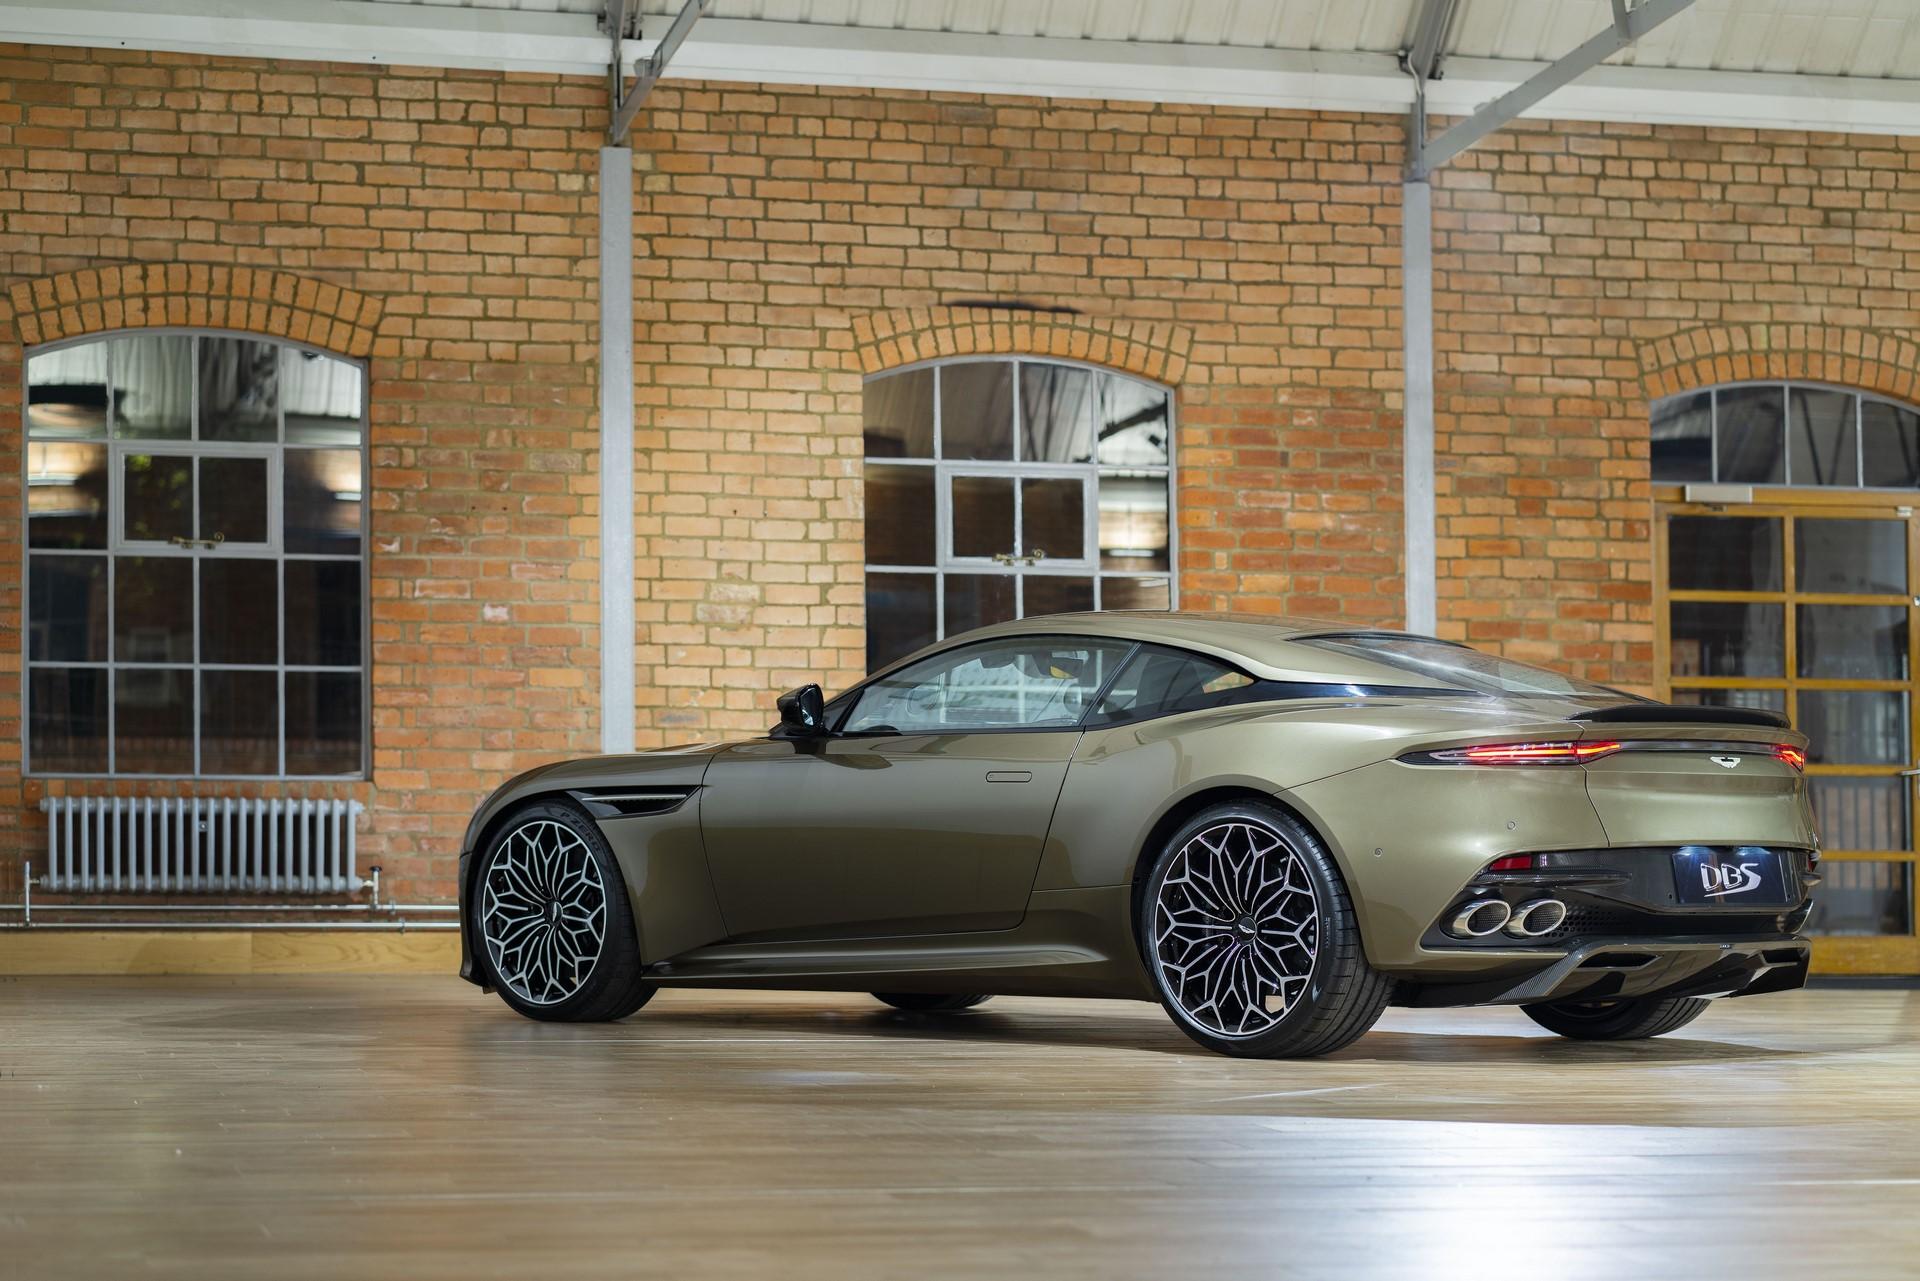 Aston-Martin-DBS-Superleggera-James-Bond-Special-Edition-6